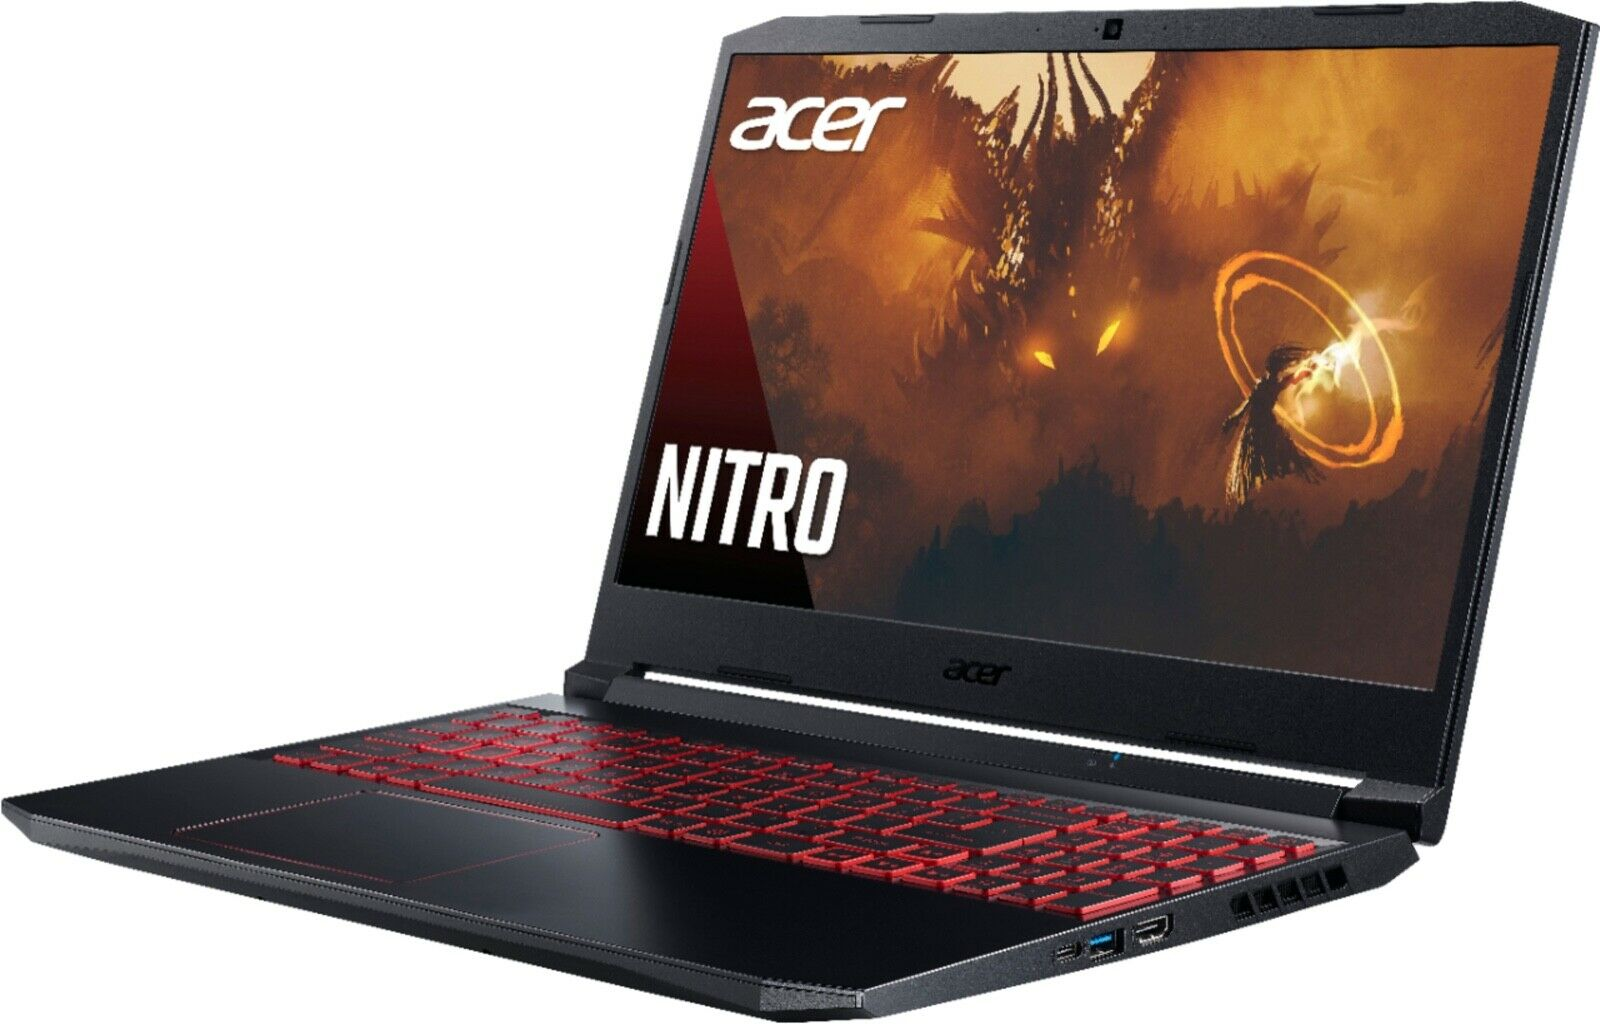 2020 Acer Nitro 5 15.6'' FHD Gaming Laptop Intel i5 GTX 1650,32GB RAM&1TB SSD